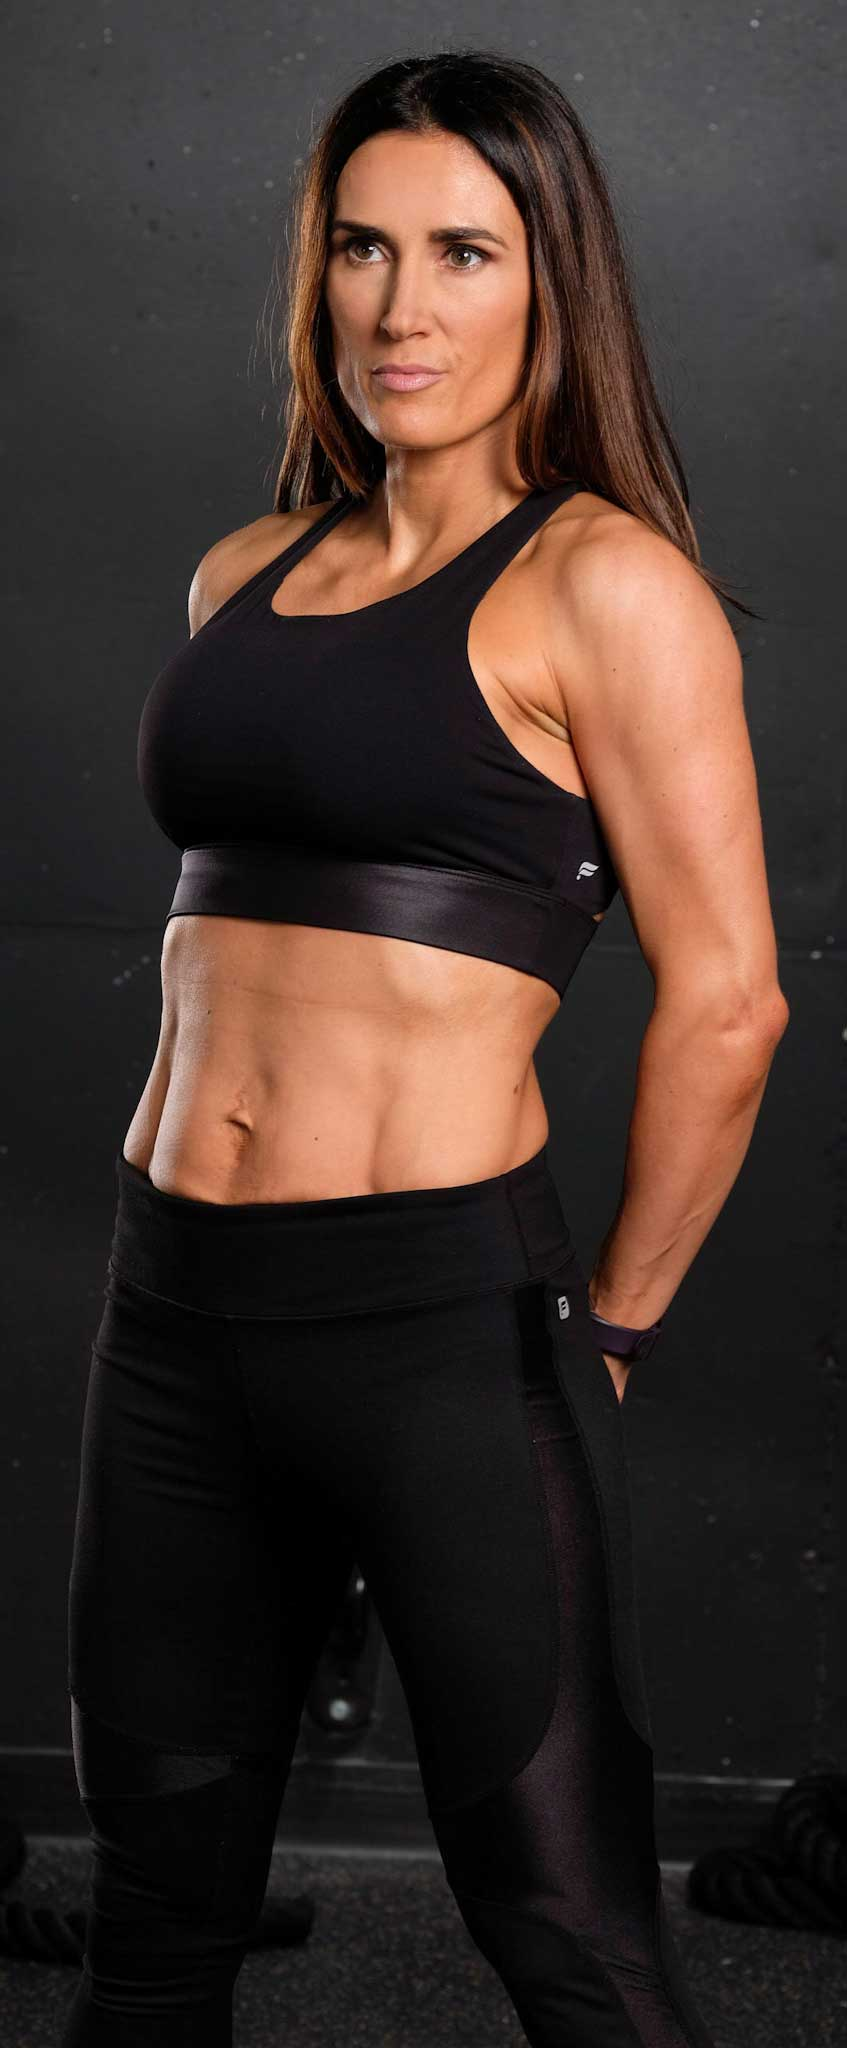 Inspirational Fitness Story Elaina Carrera Fitness